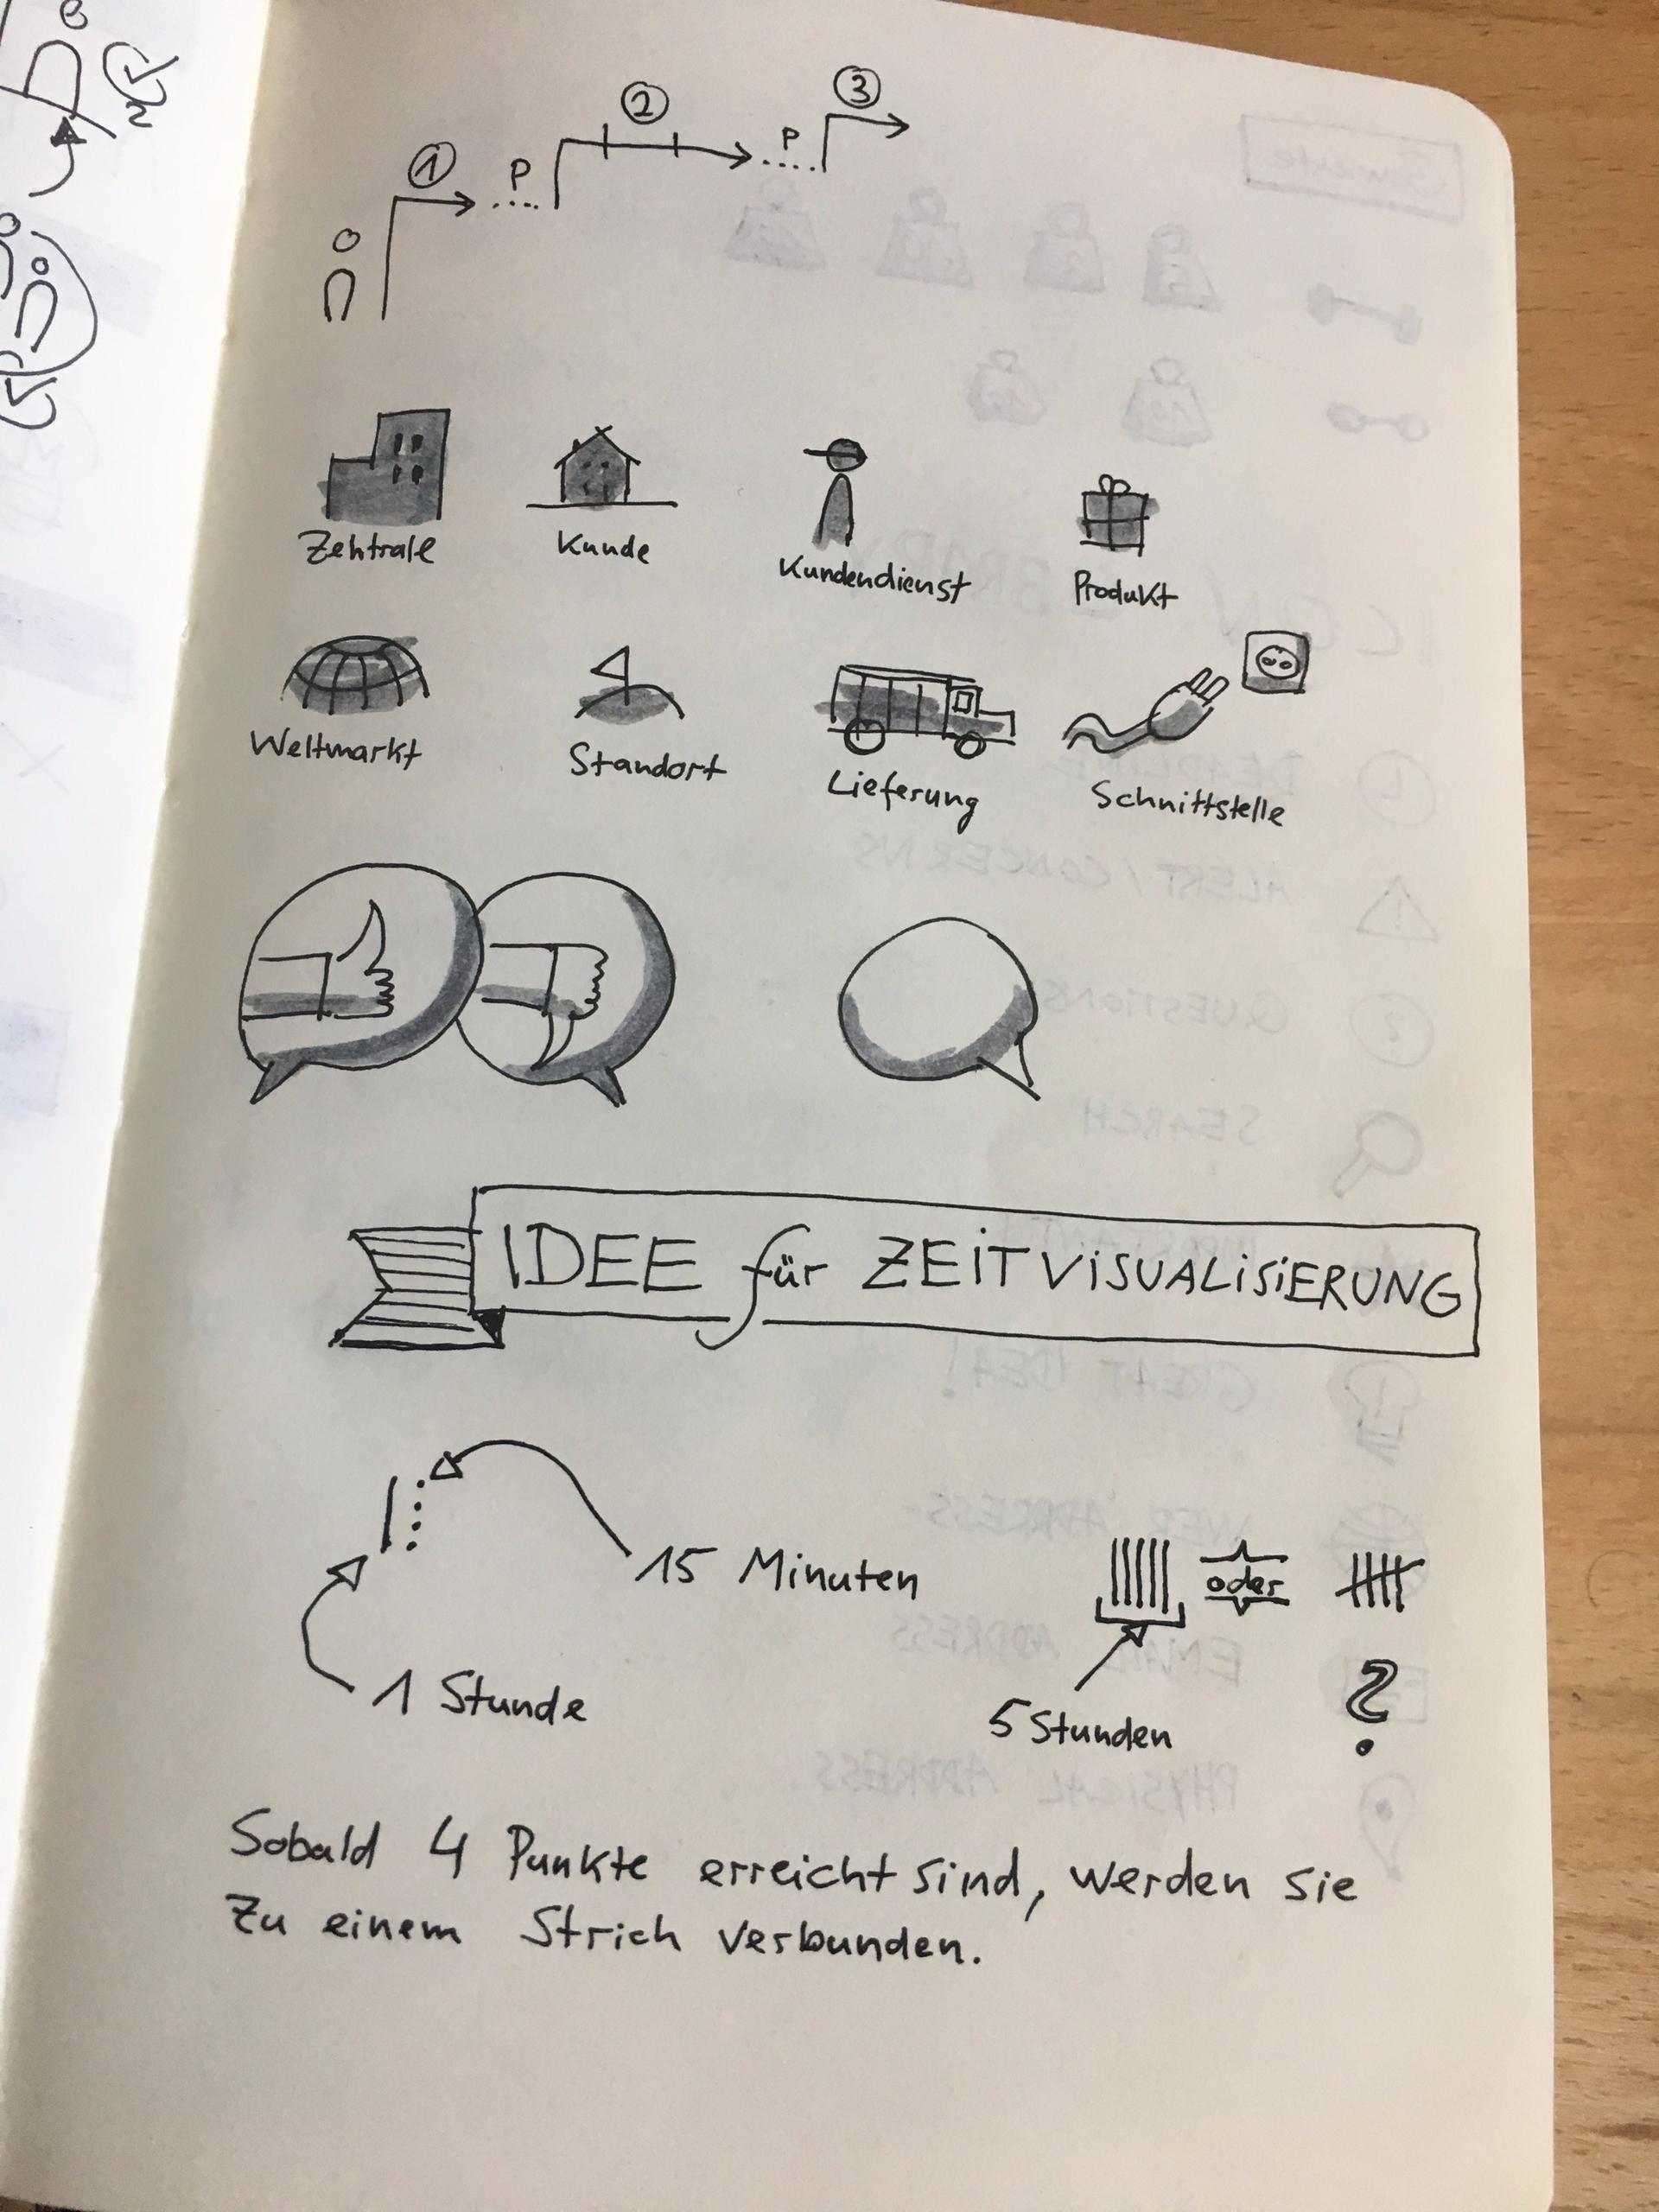 Pages Sketchnote notebook - sketchnotes - kogakure | ello